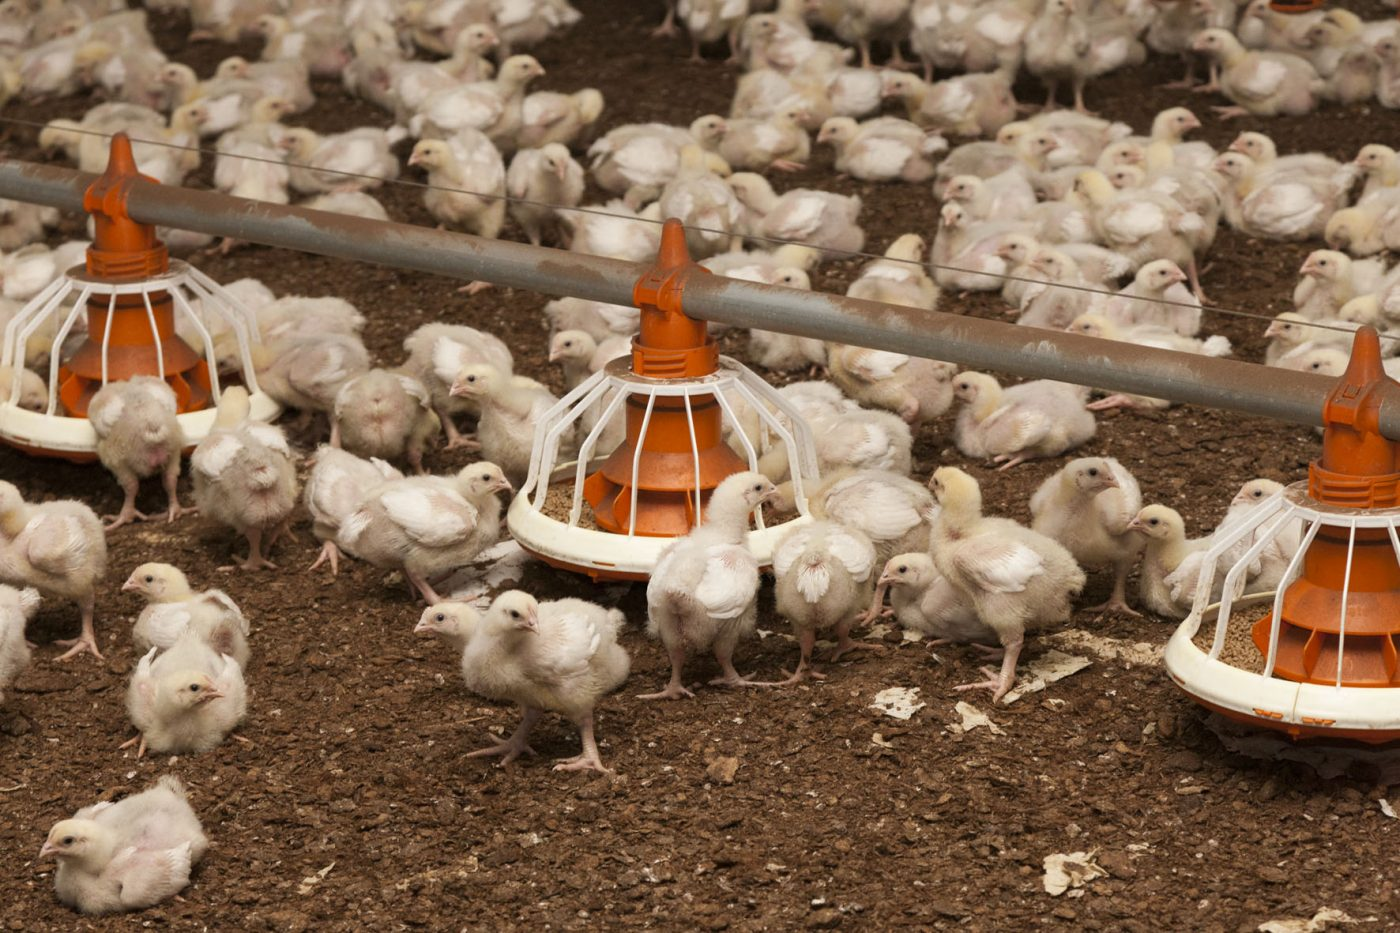 Poultry Suomeksi